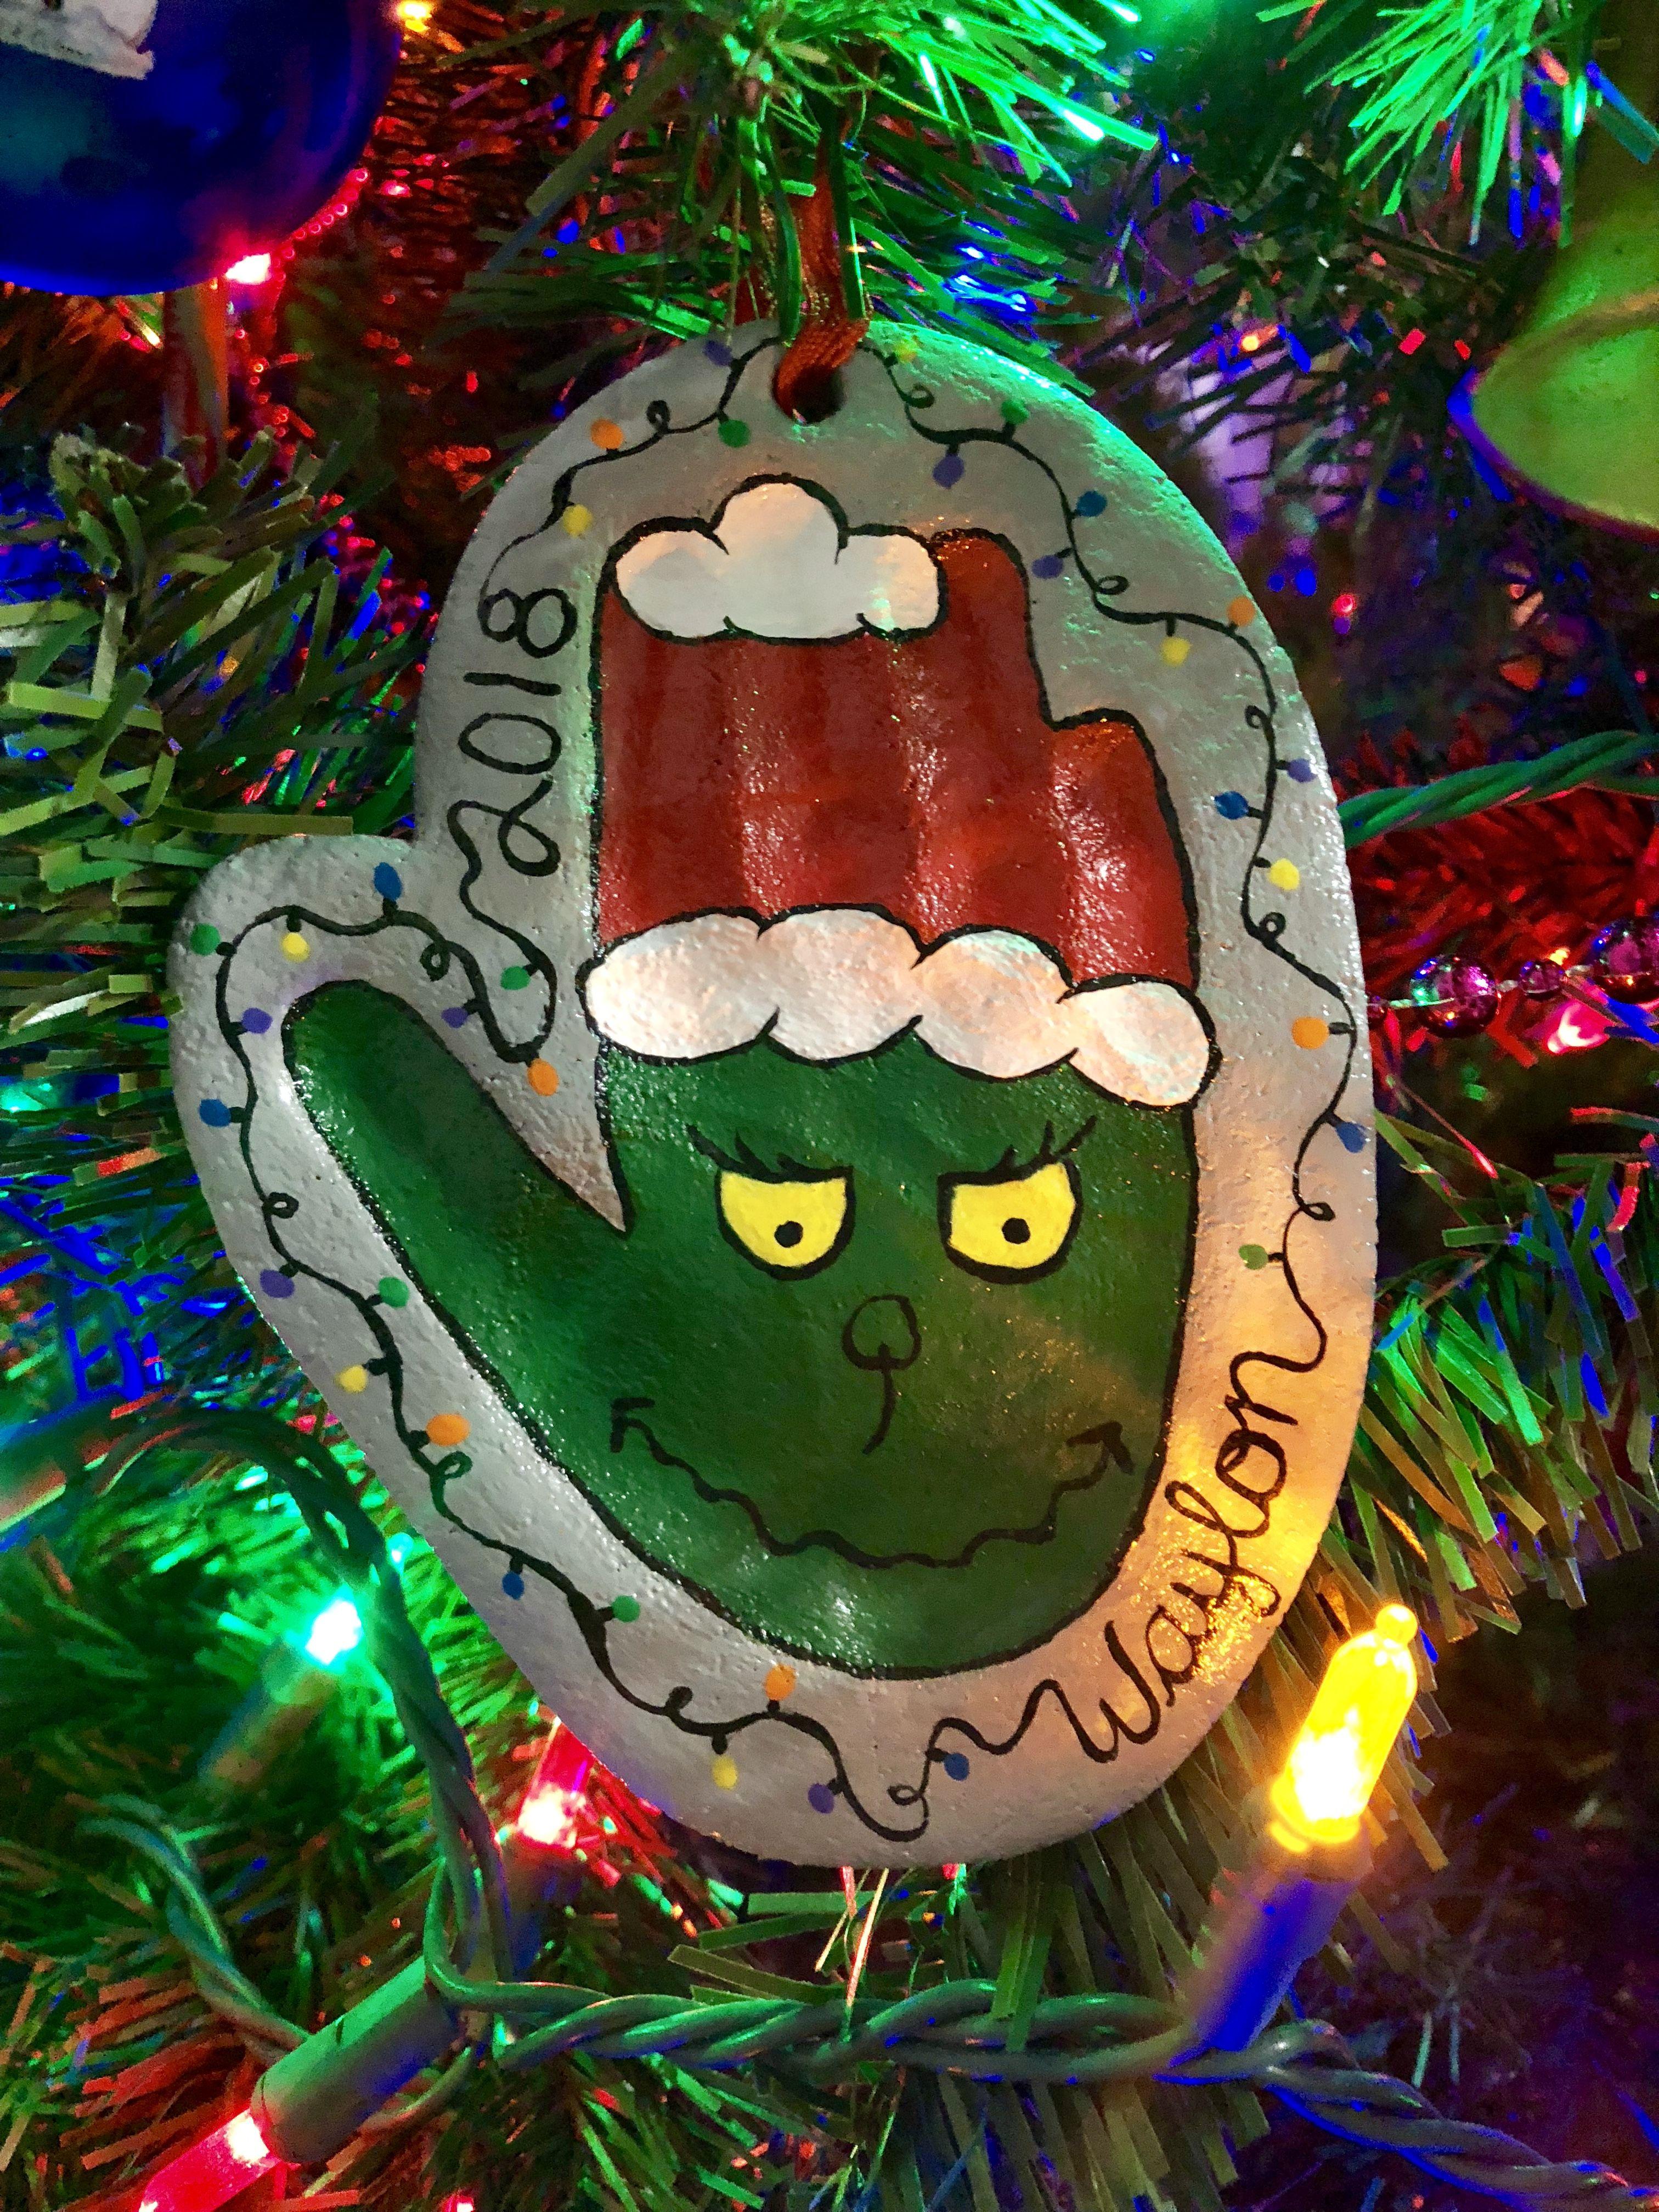 Grinch Salt Dough Handprint Diy Christmas Ornaments Christmas Crafts Christmas Ornaments